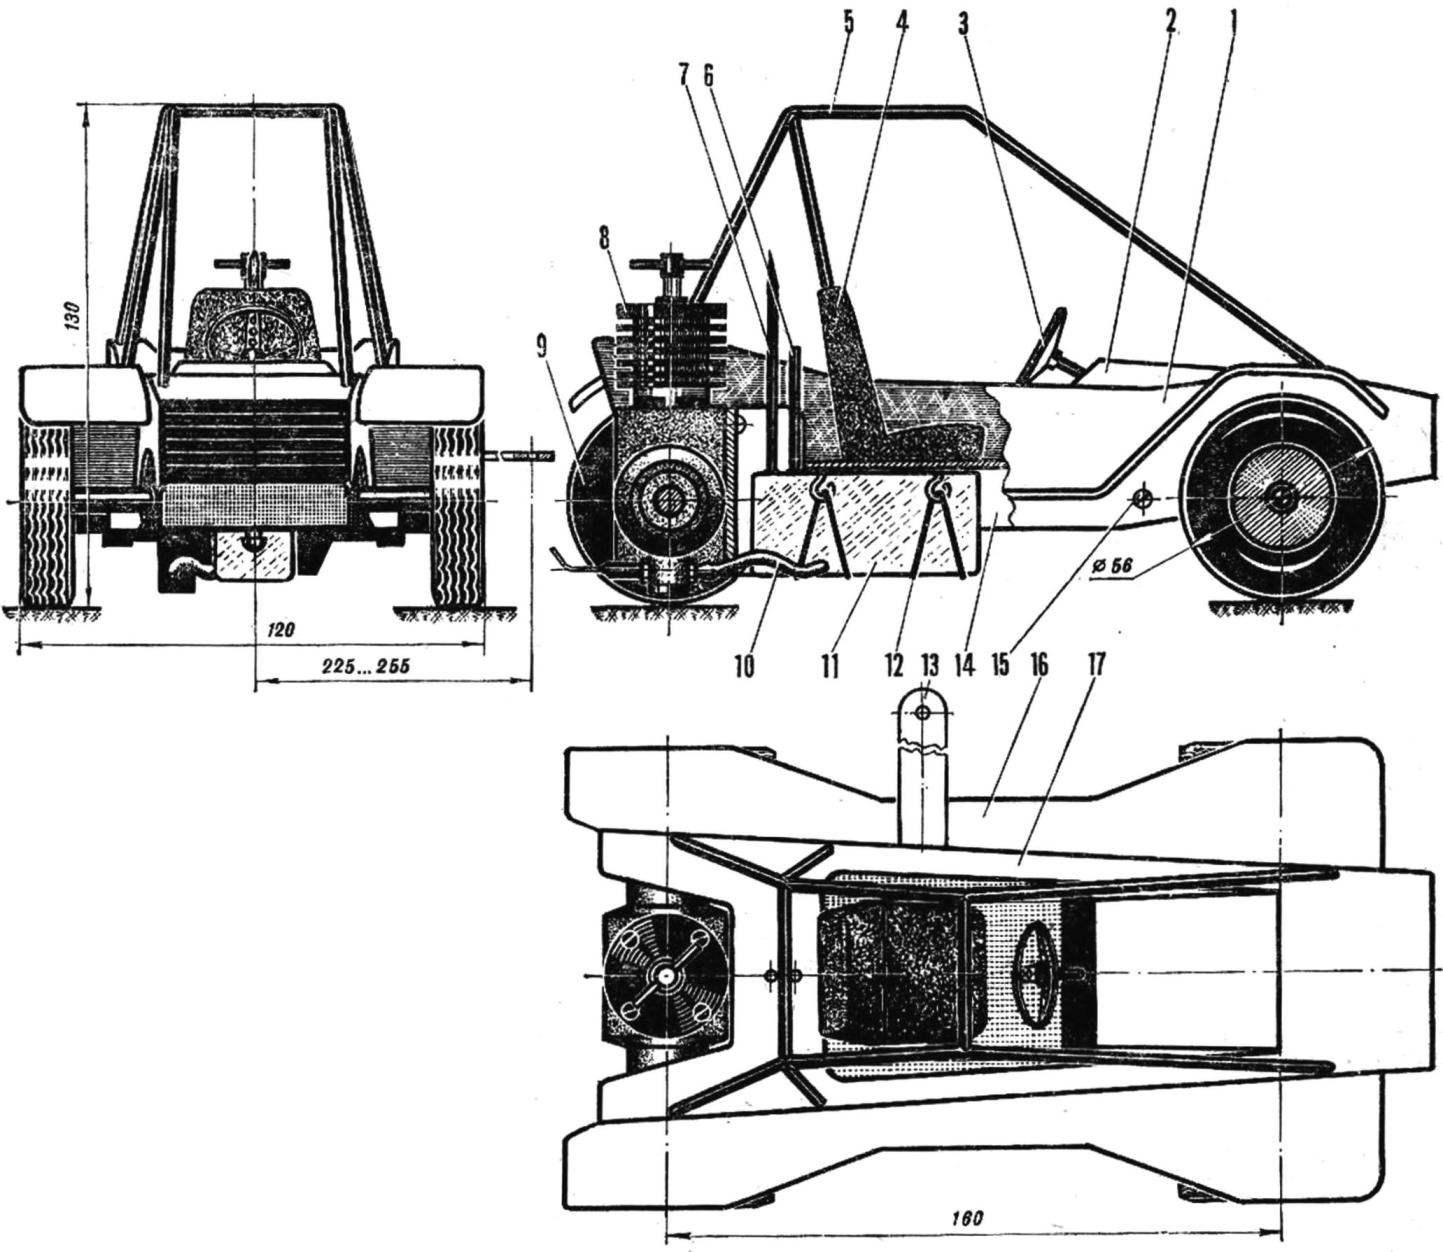 Fig. 1. Training car class